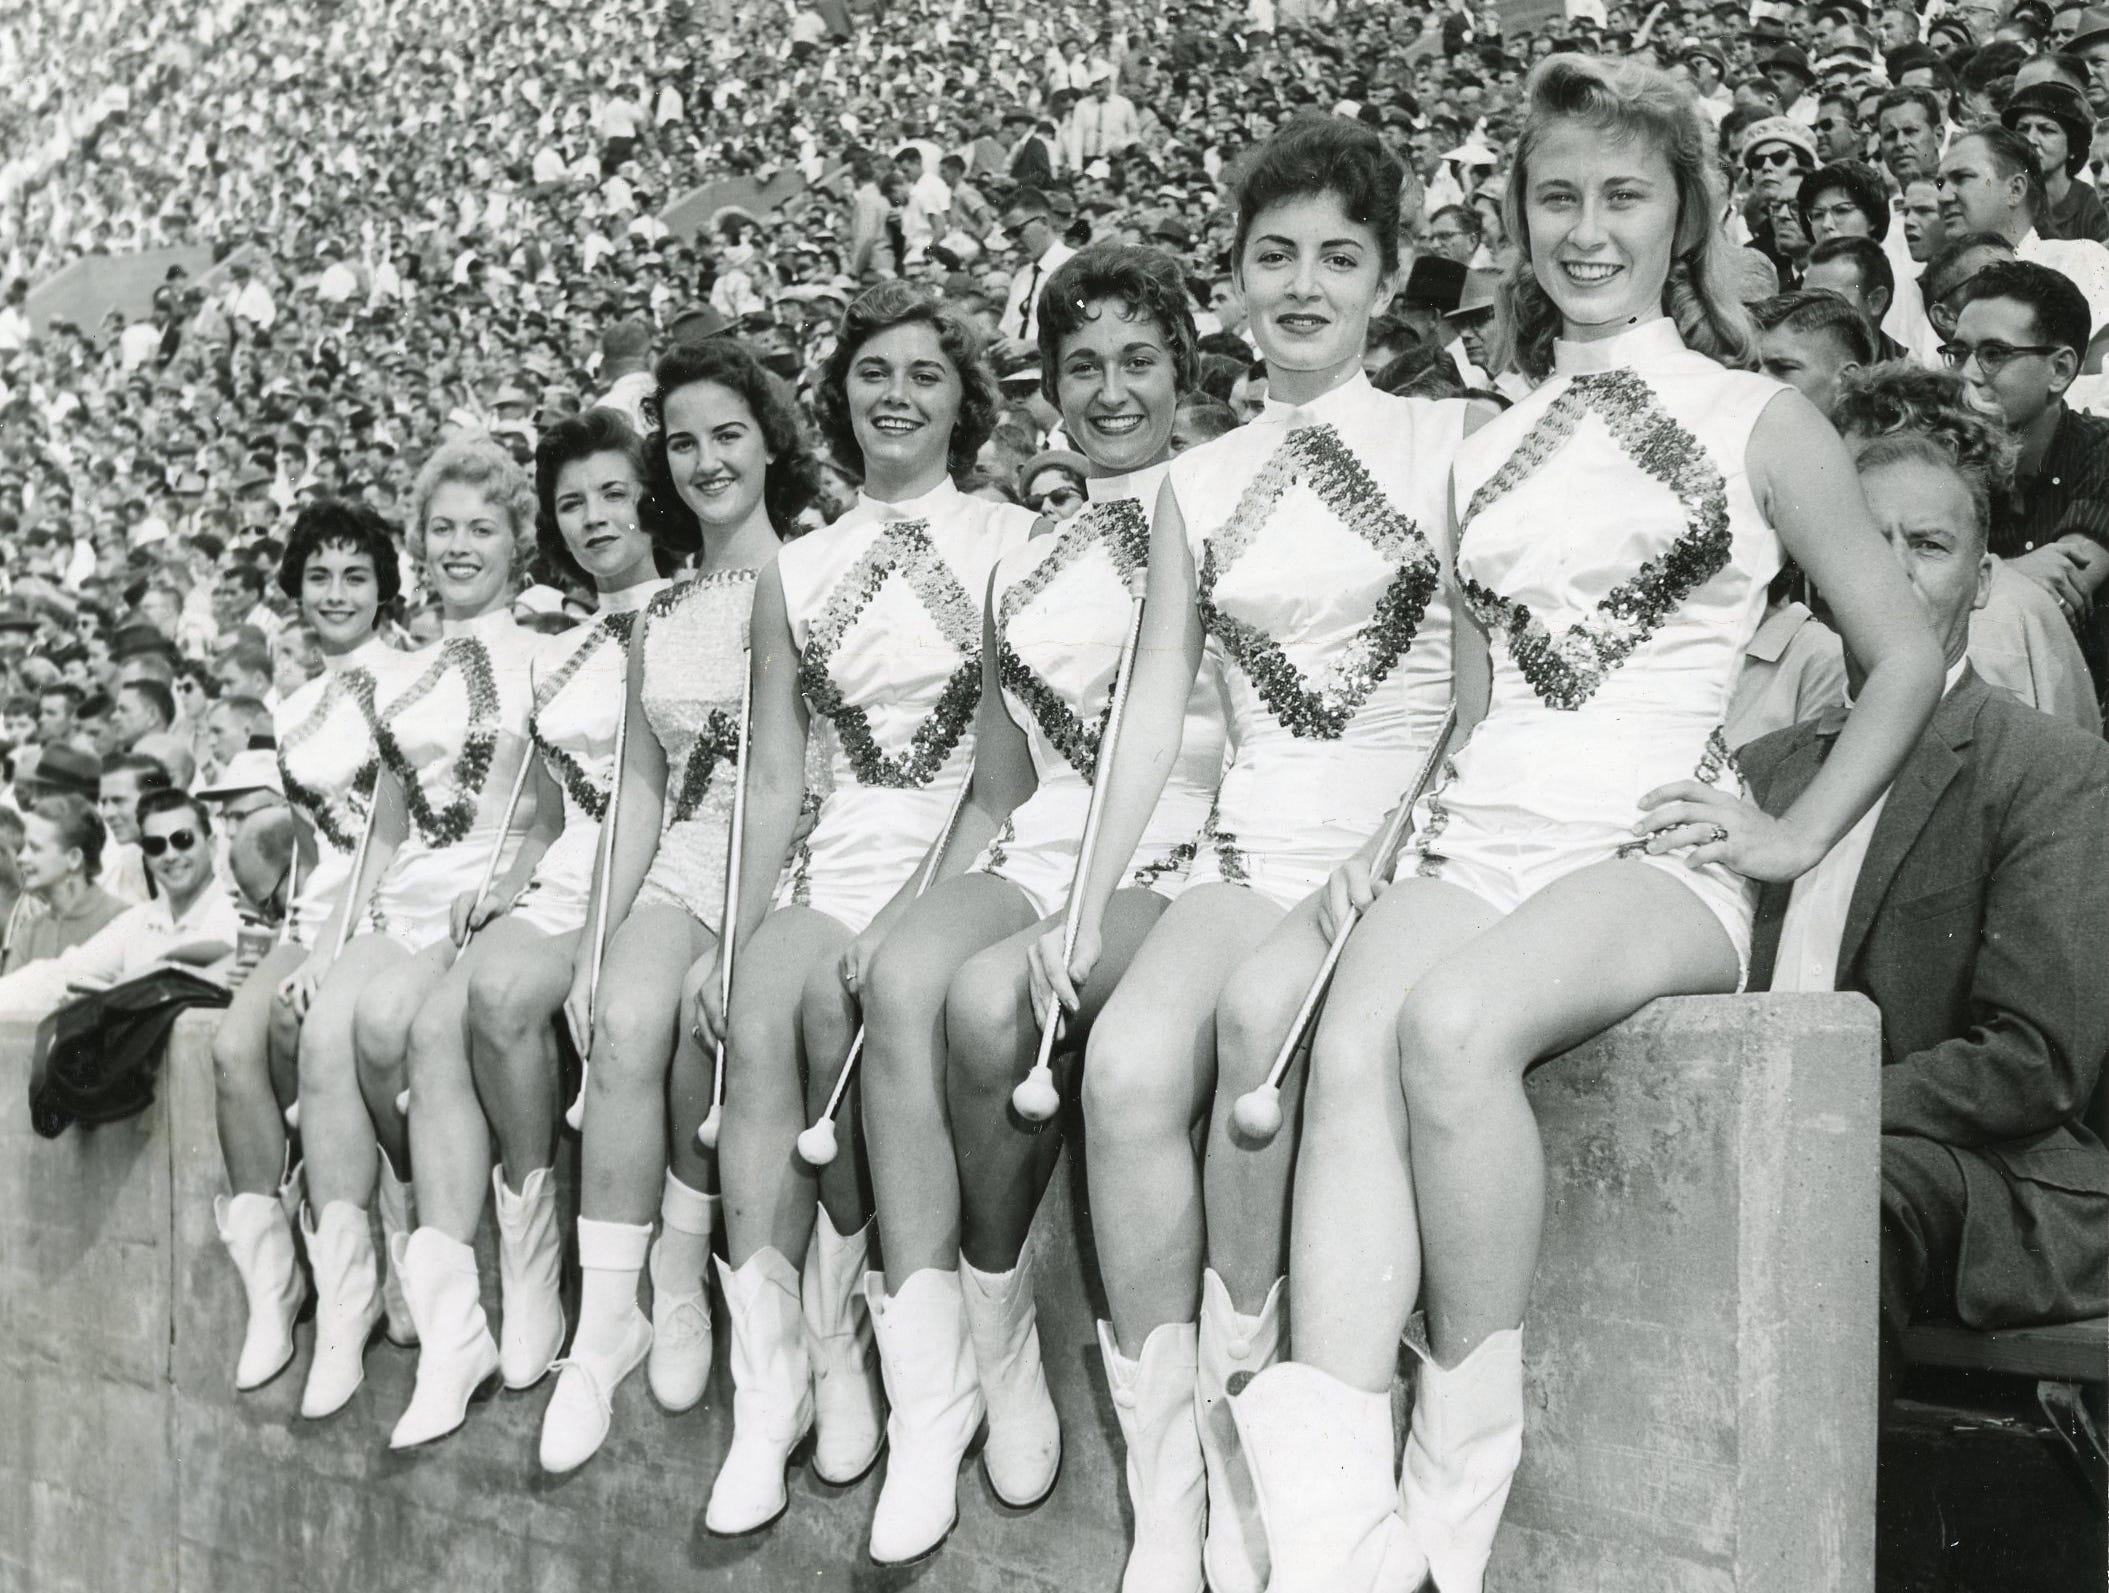 UT majorettes (from left) Brenda Jo Smith, Helen Newport, Mary Ruth DeArmond, Claudette Riley, Celia Wright, Phyllis Swann, Lyna Free and Jo Hawk. October, 1959.